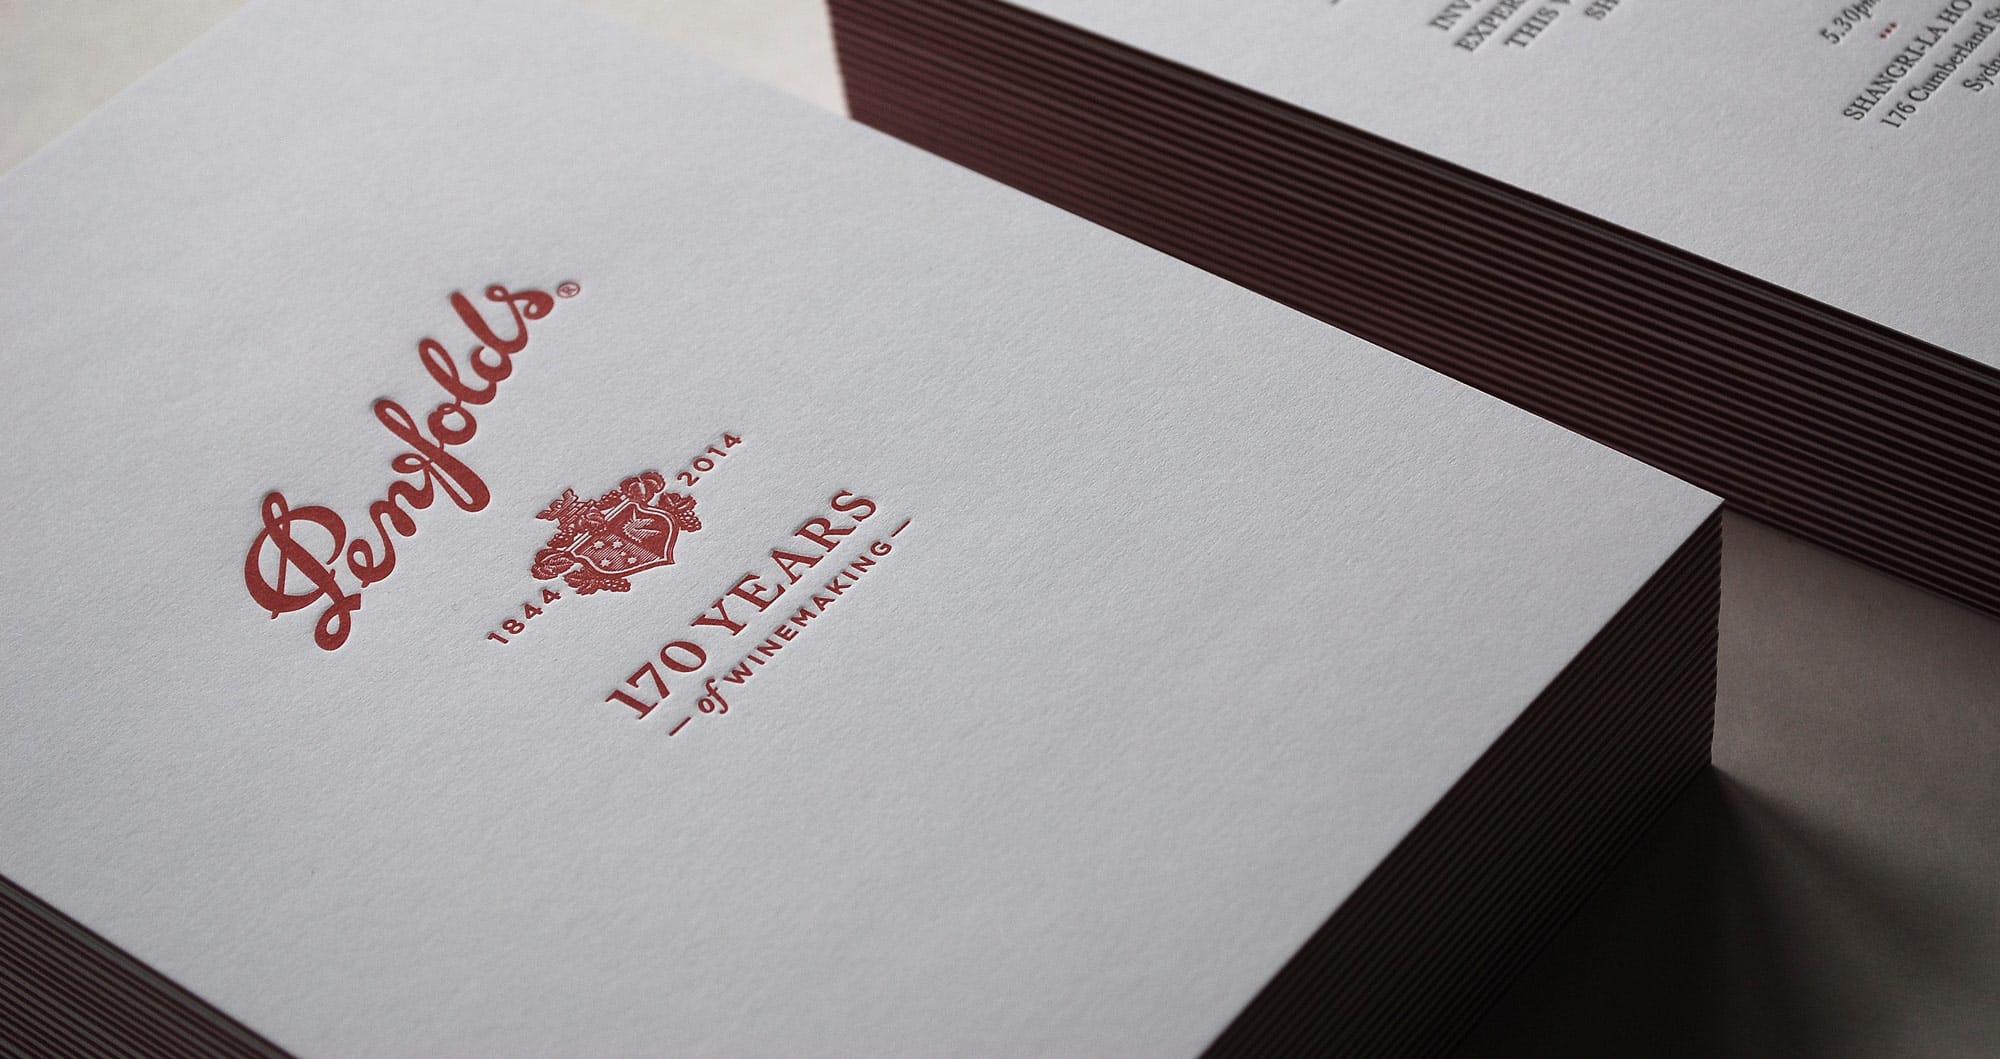 Penfolds Letterpress Print Design